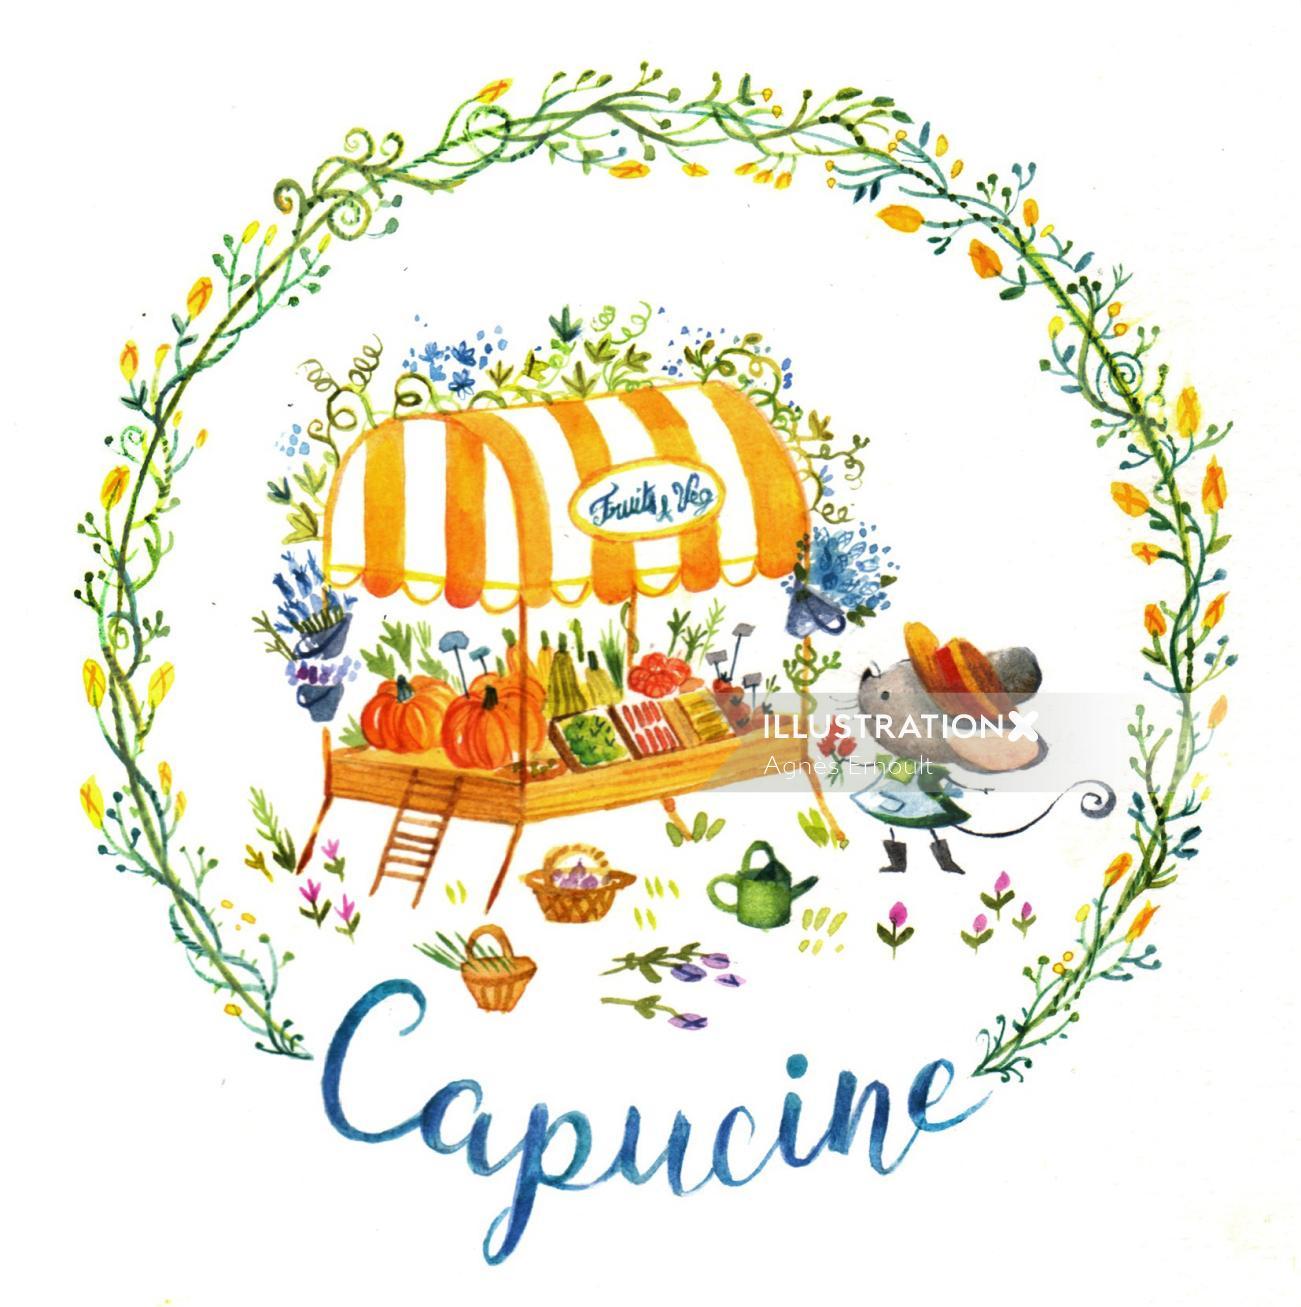 Capucine watercolor painting